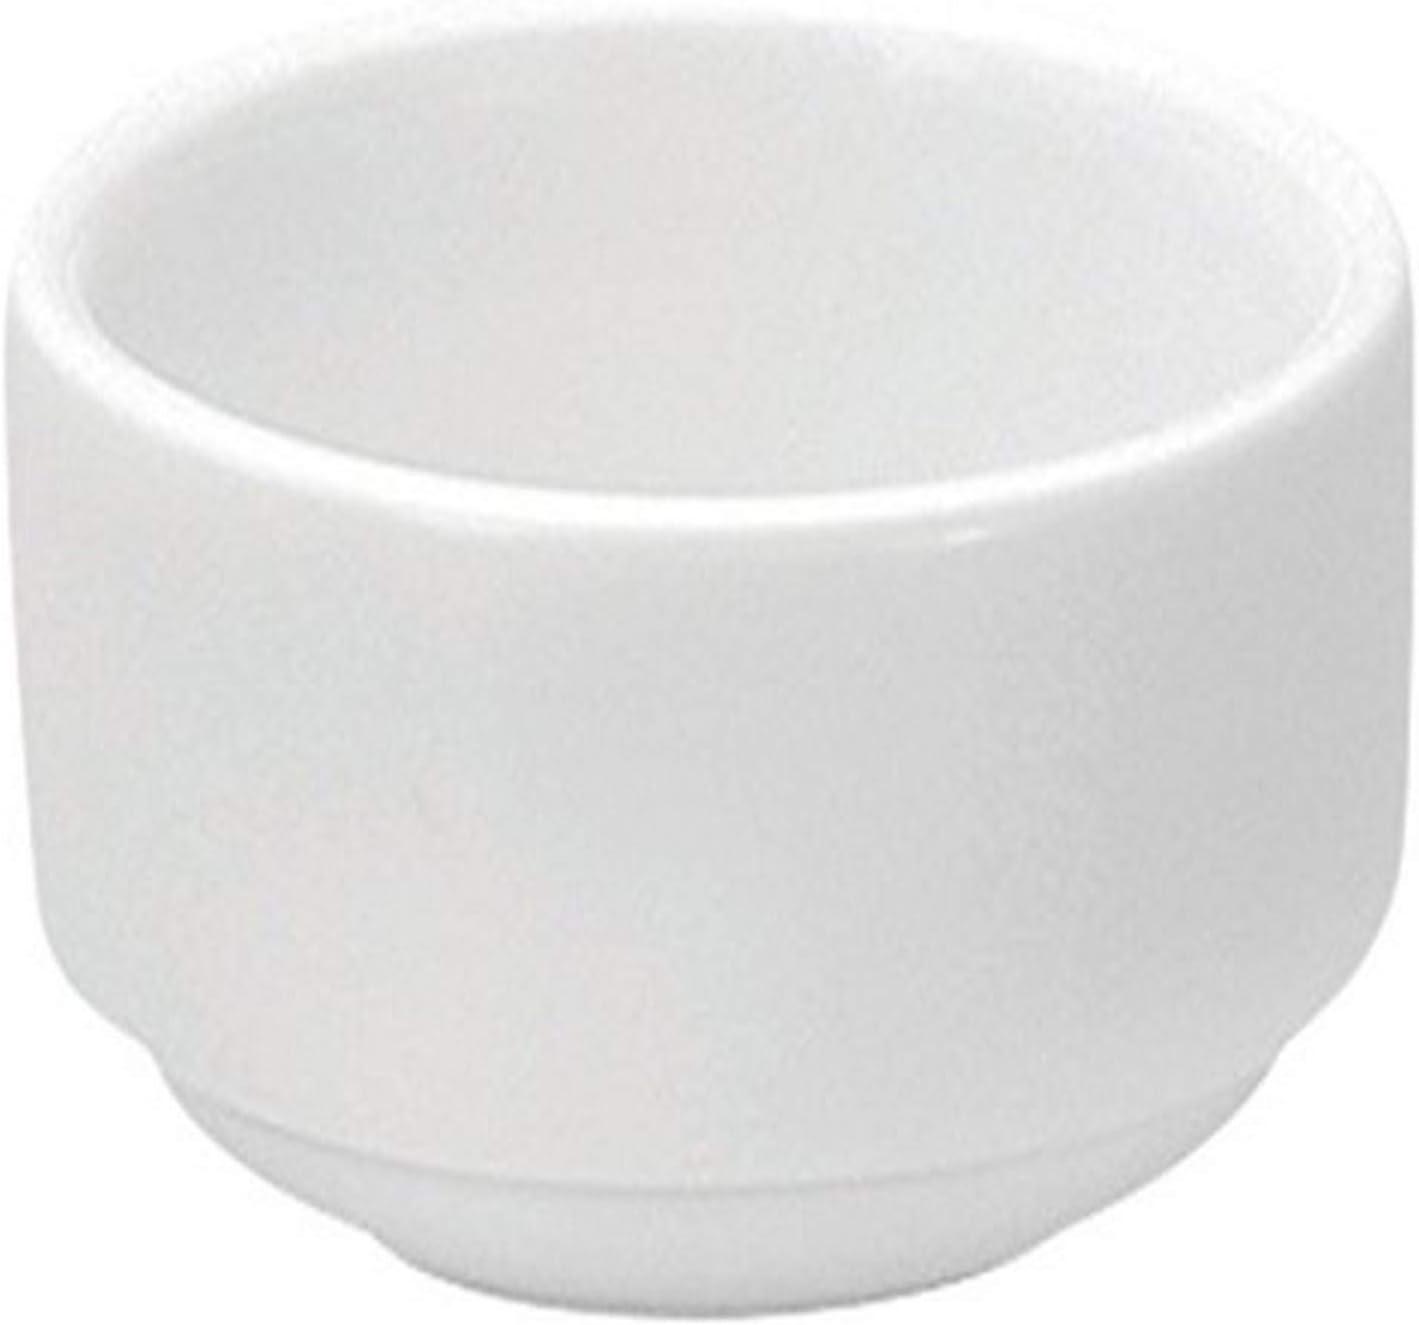 Oneida Foodservice Bright White Porcelain, Set of 72, Mini Ramekin